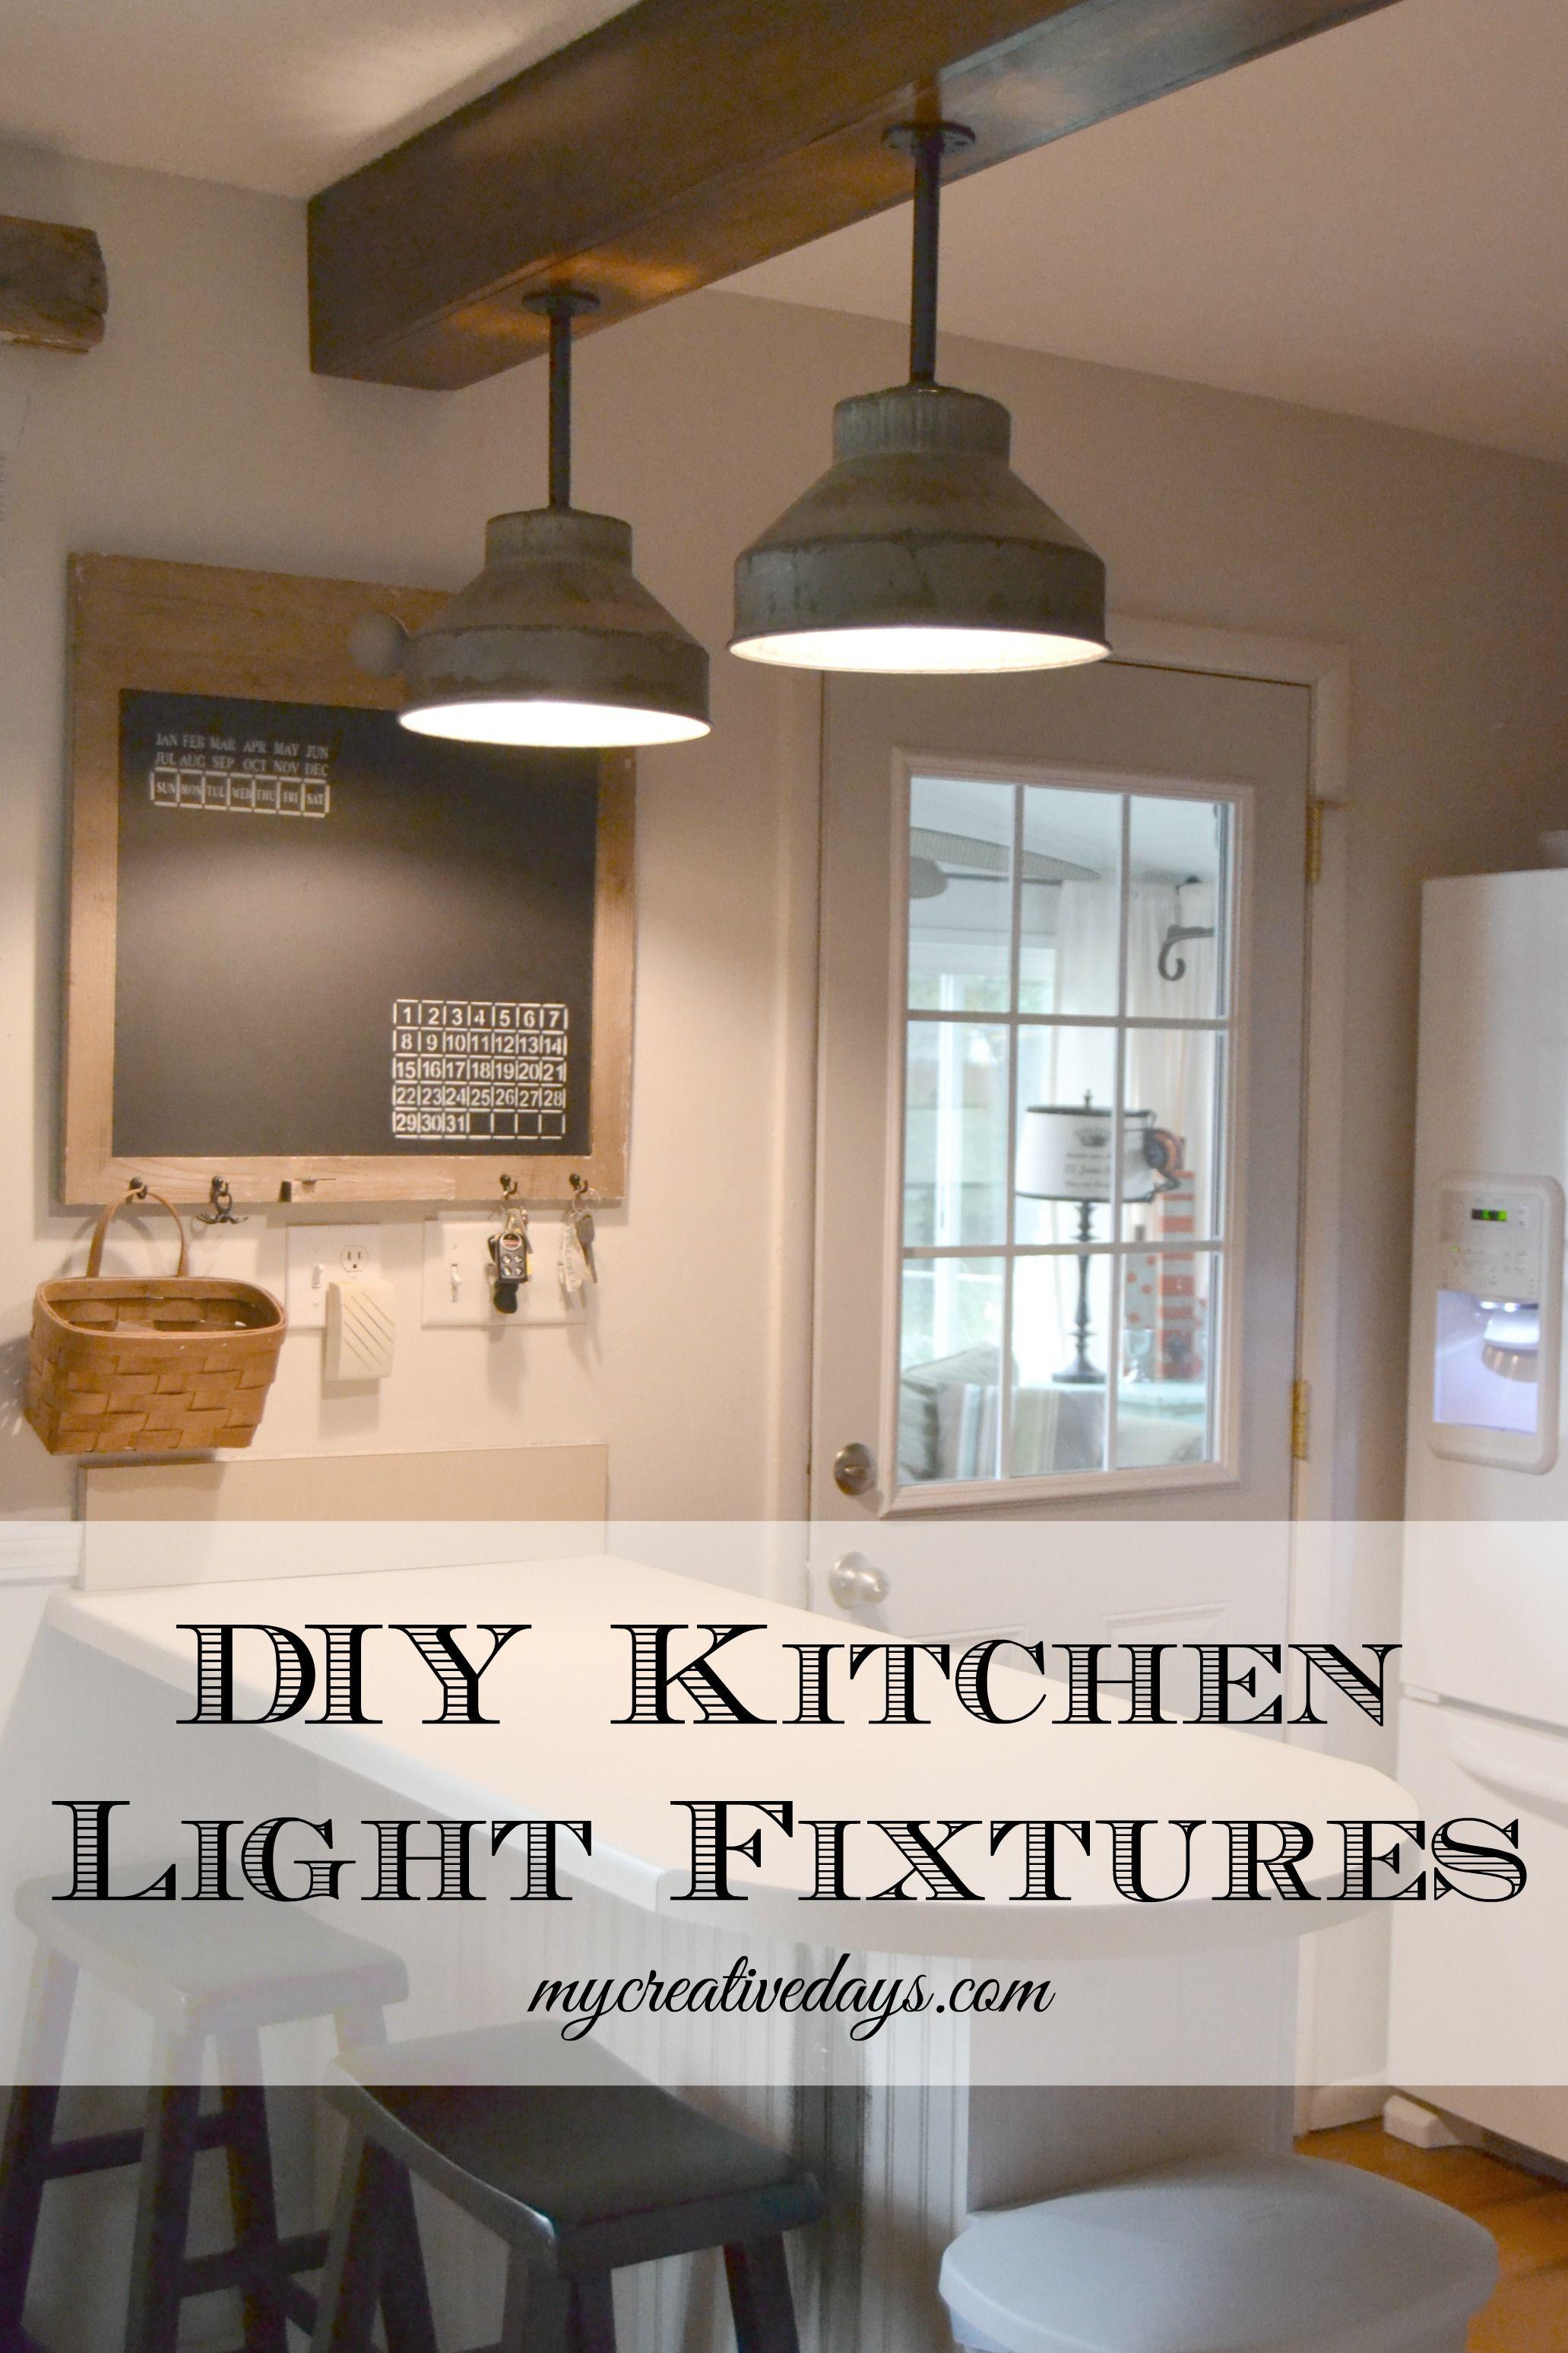 Diy light fixtures for the kitchen diy kitchen lighting